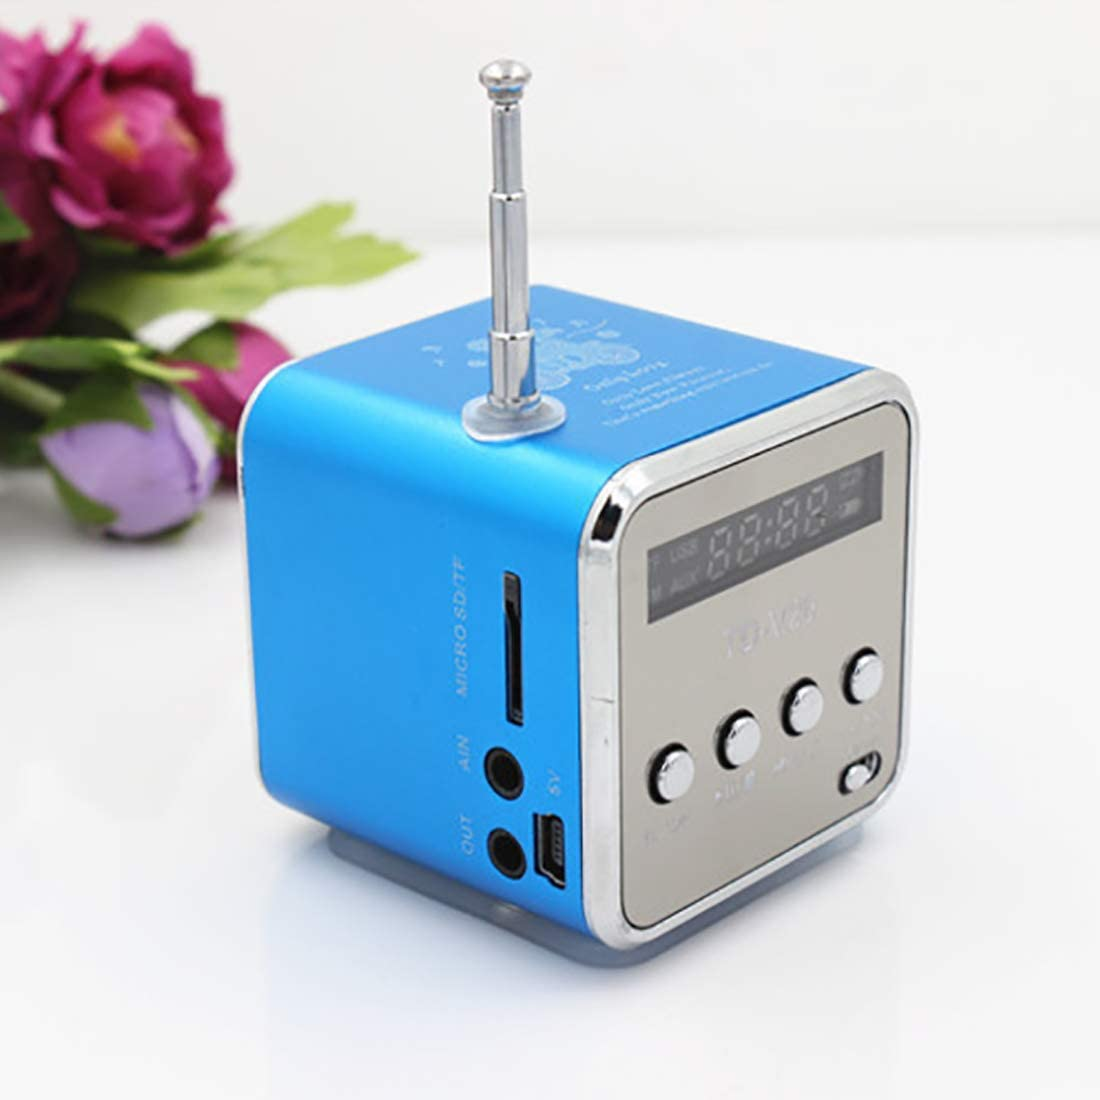 Blue Fm Radio Usb Mini Consumer Electronics Computers Super Bass Speaker Mini Speaker Home Audio Video Portable Speaker Tech /& Gadgets for Mobile Phone Music